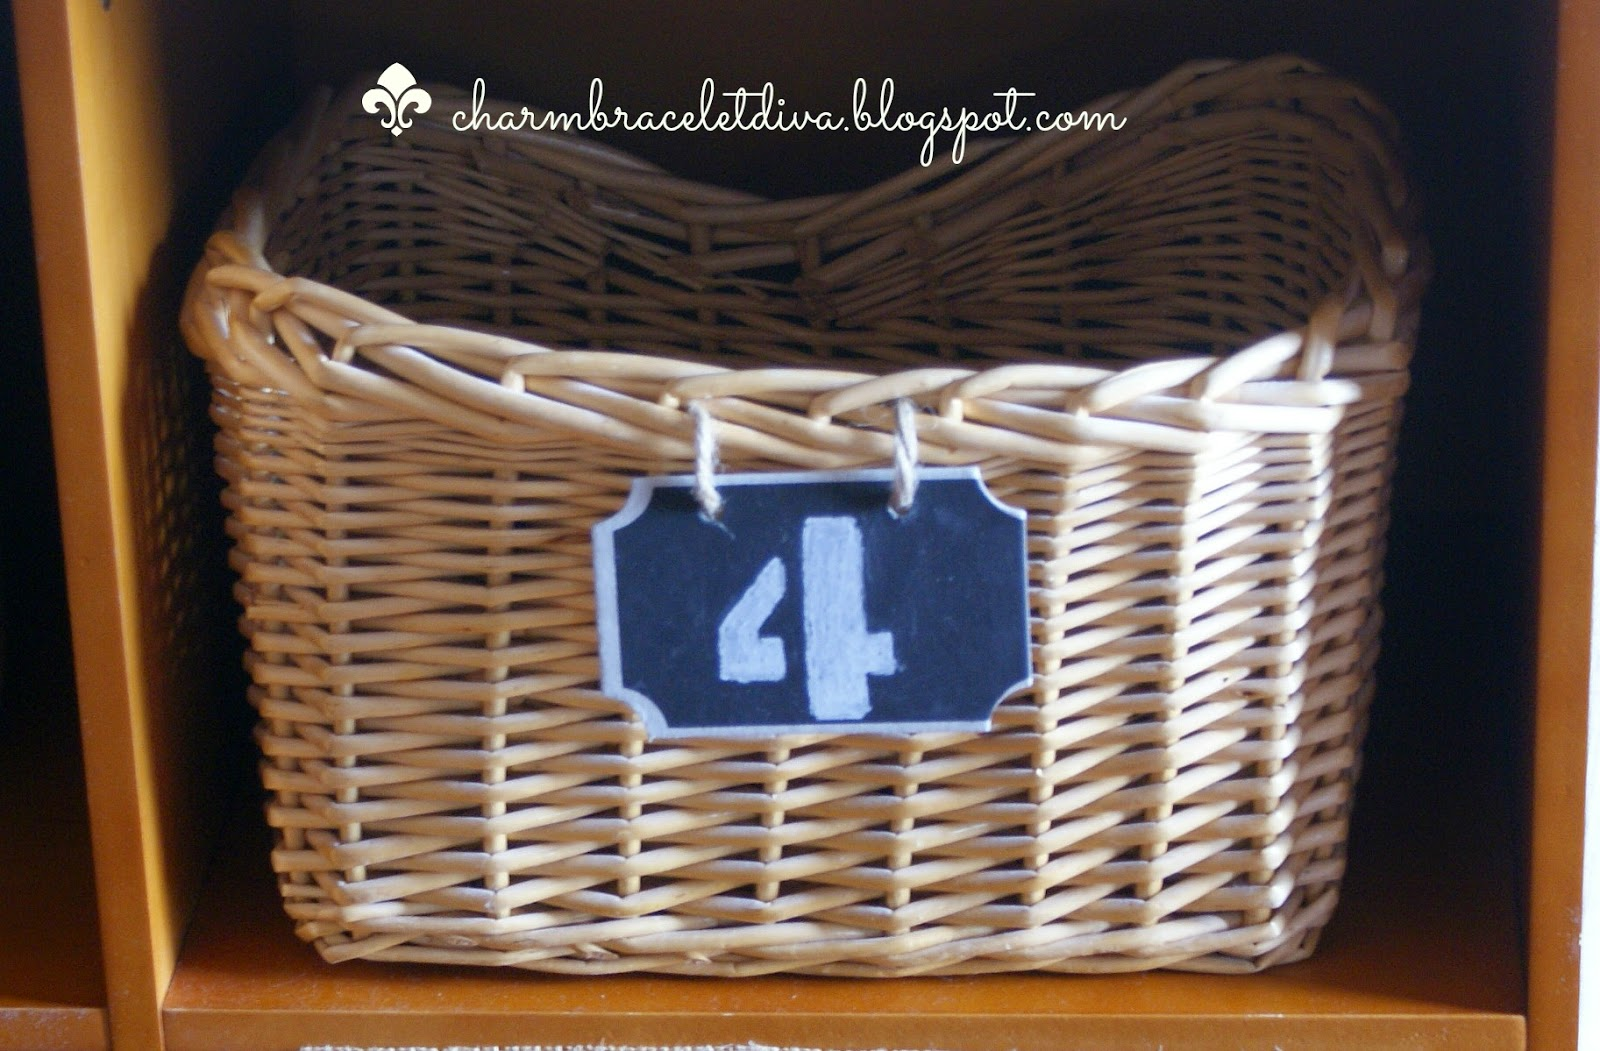 storage basket with number 4 chalkboard tag